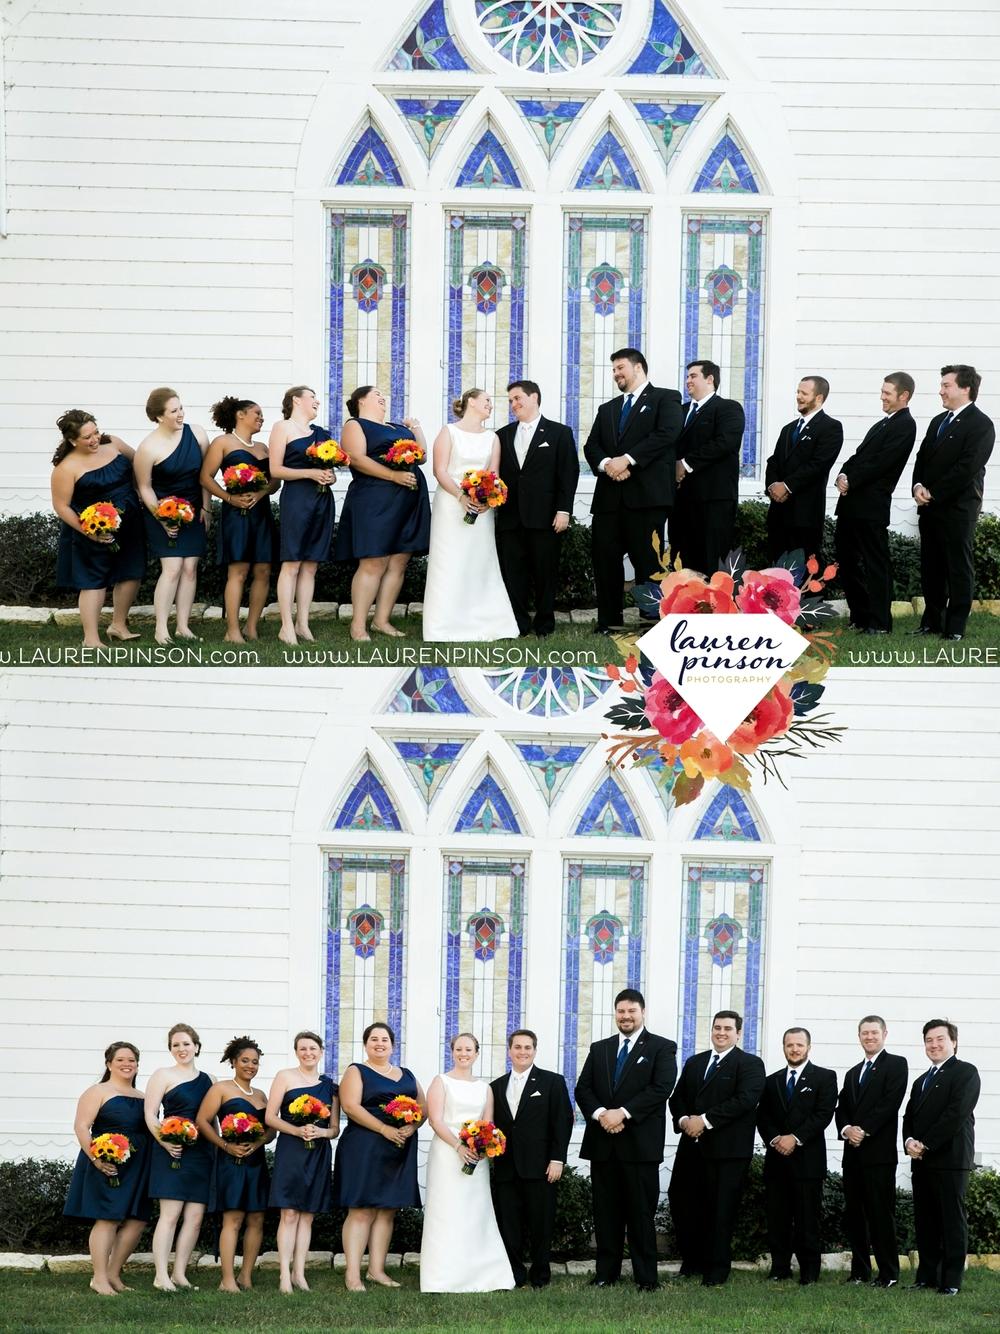 bells-texas-wedding-photography-at-willowood-ranch-chapel-north-texas-wichita-falls-wedding-photographer_1844.jpg